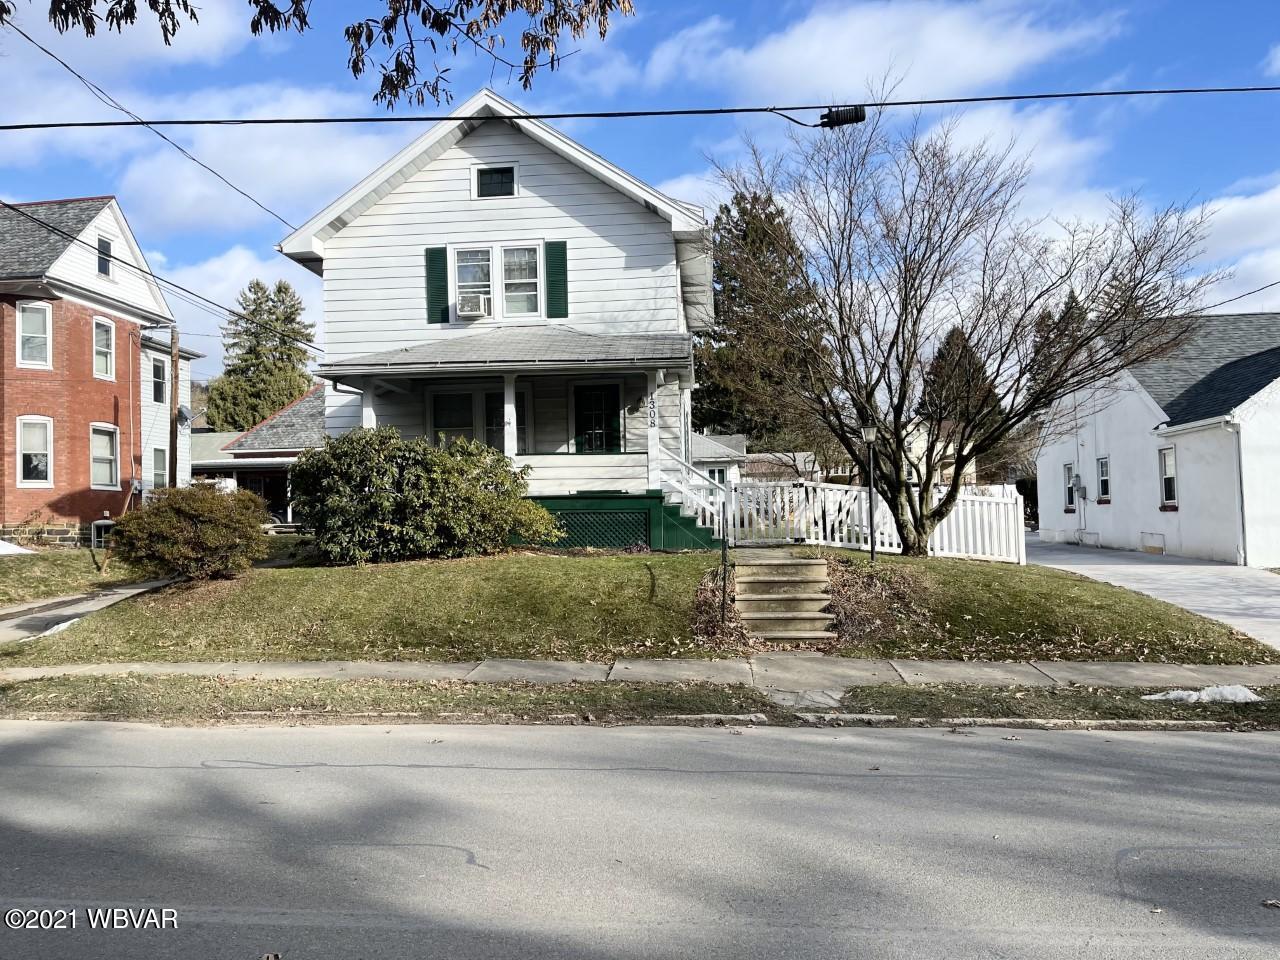 1308 MARKET STREET, Williamsport, PA 17701, 3 Bedrooms Bedrooms, ,1 BathroomBathrooms,Residential,For sale,MARKET,WB-91792